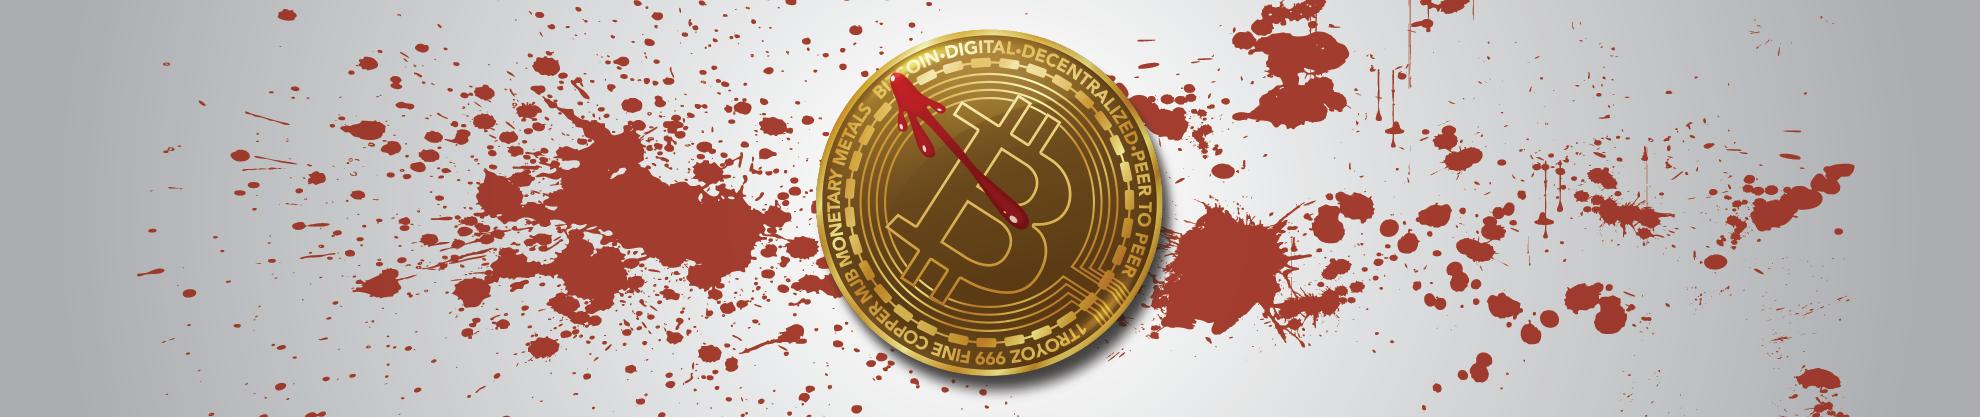 Bitcoin's wild ride